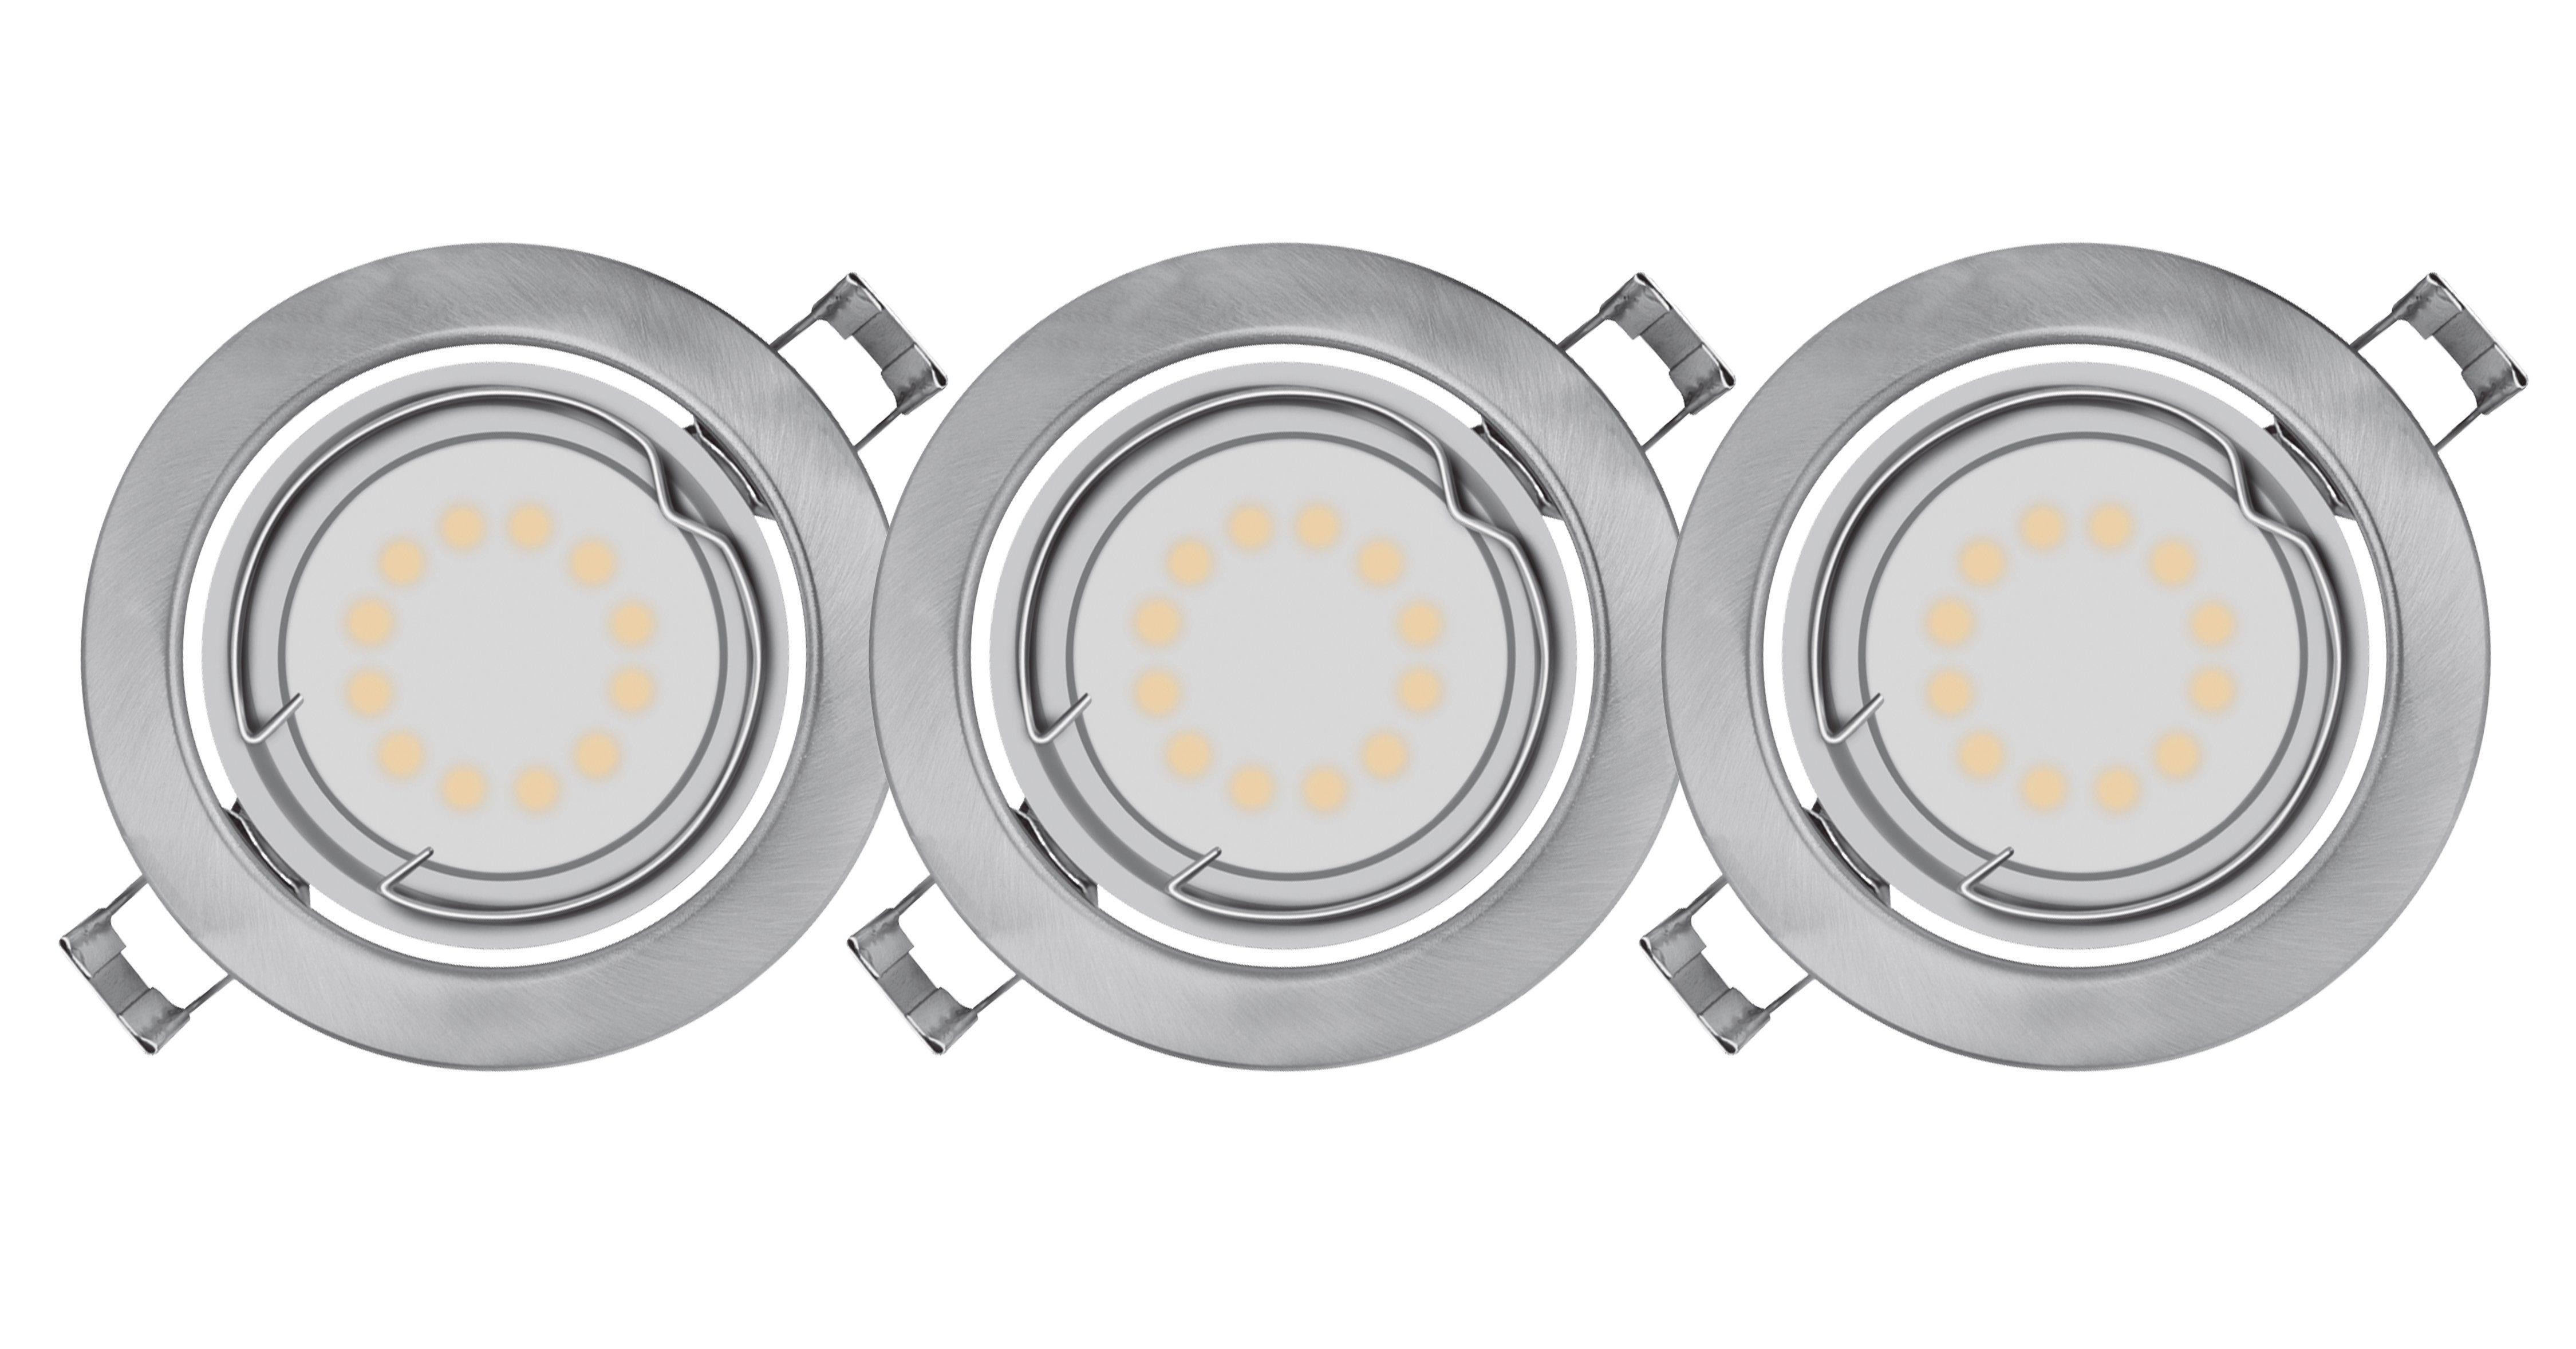 Osram Einbaustrahler für LED-Reflektorlampen, GU10-Sockel »LED DOWNLIGHT SET 3 x 3 W 827«